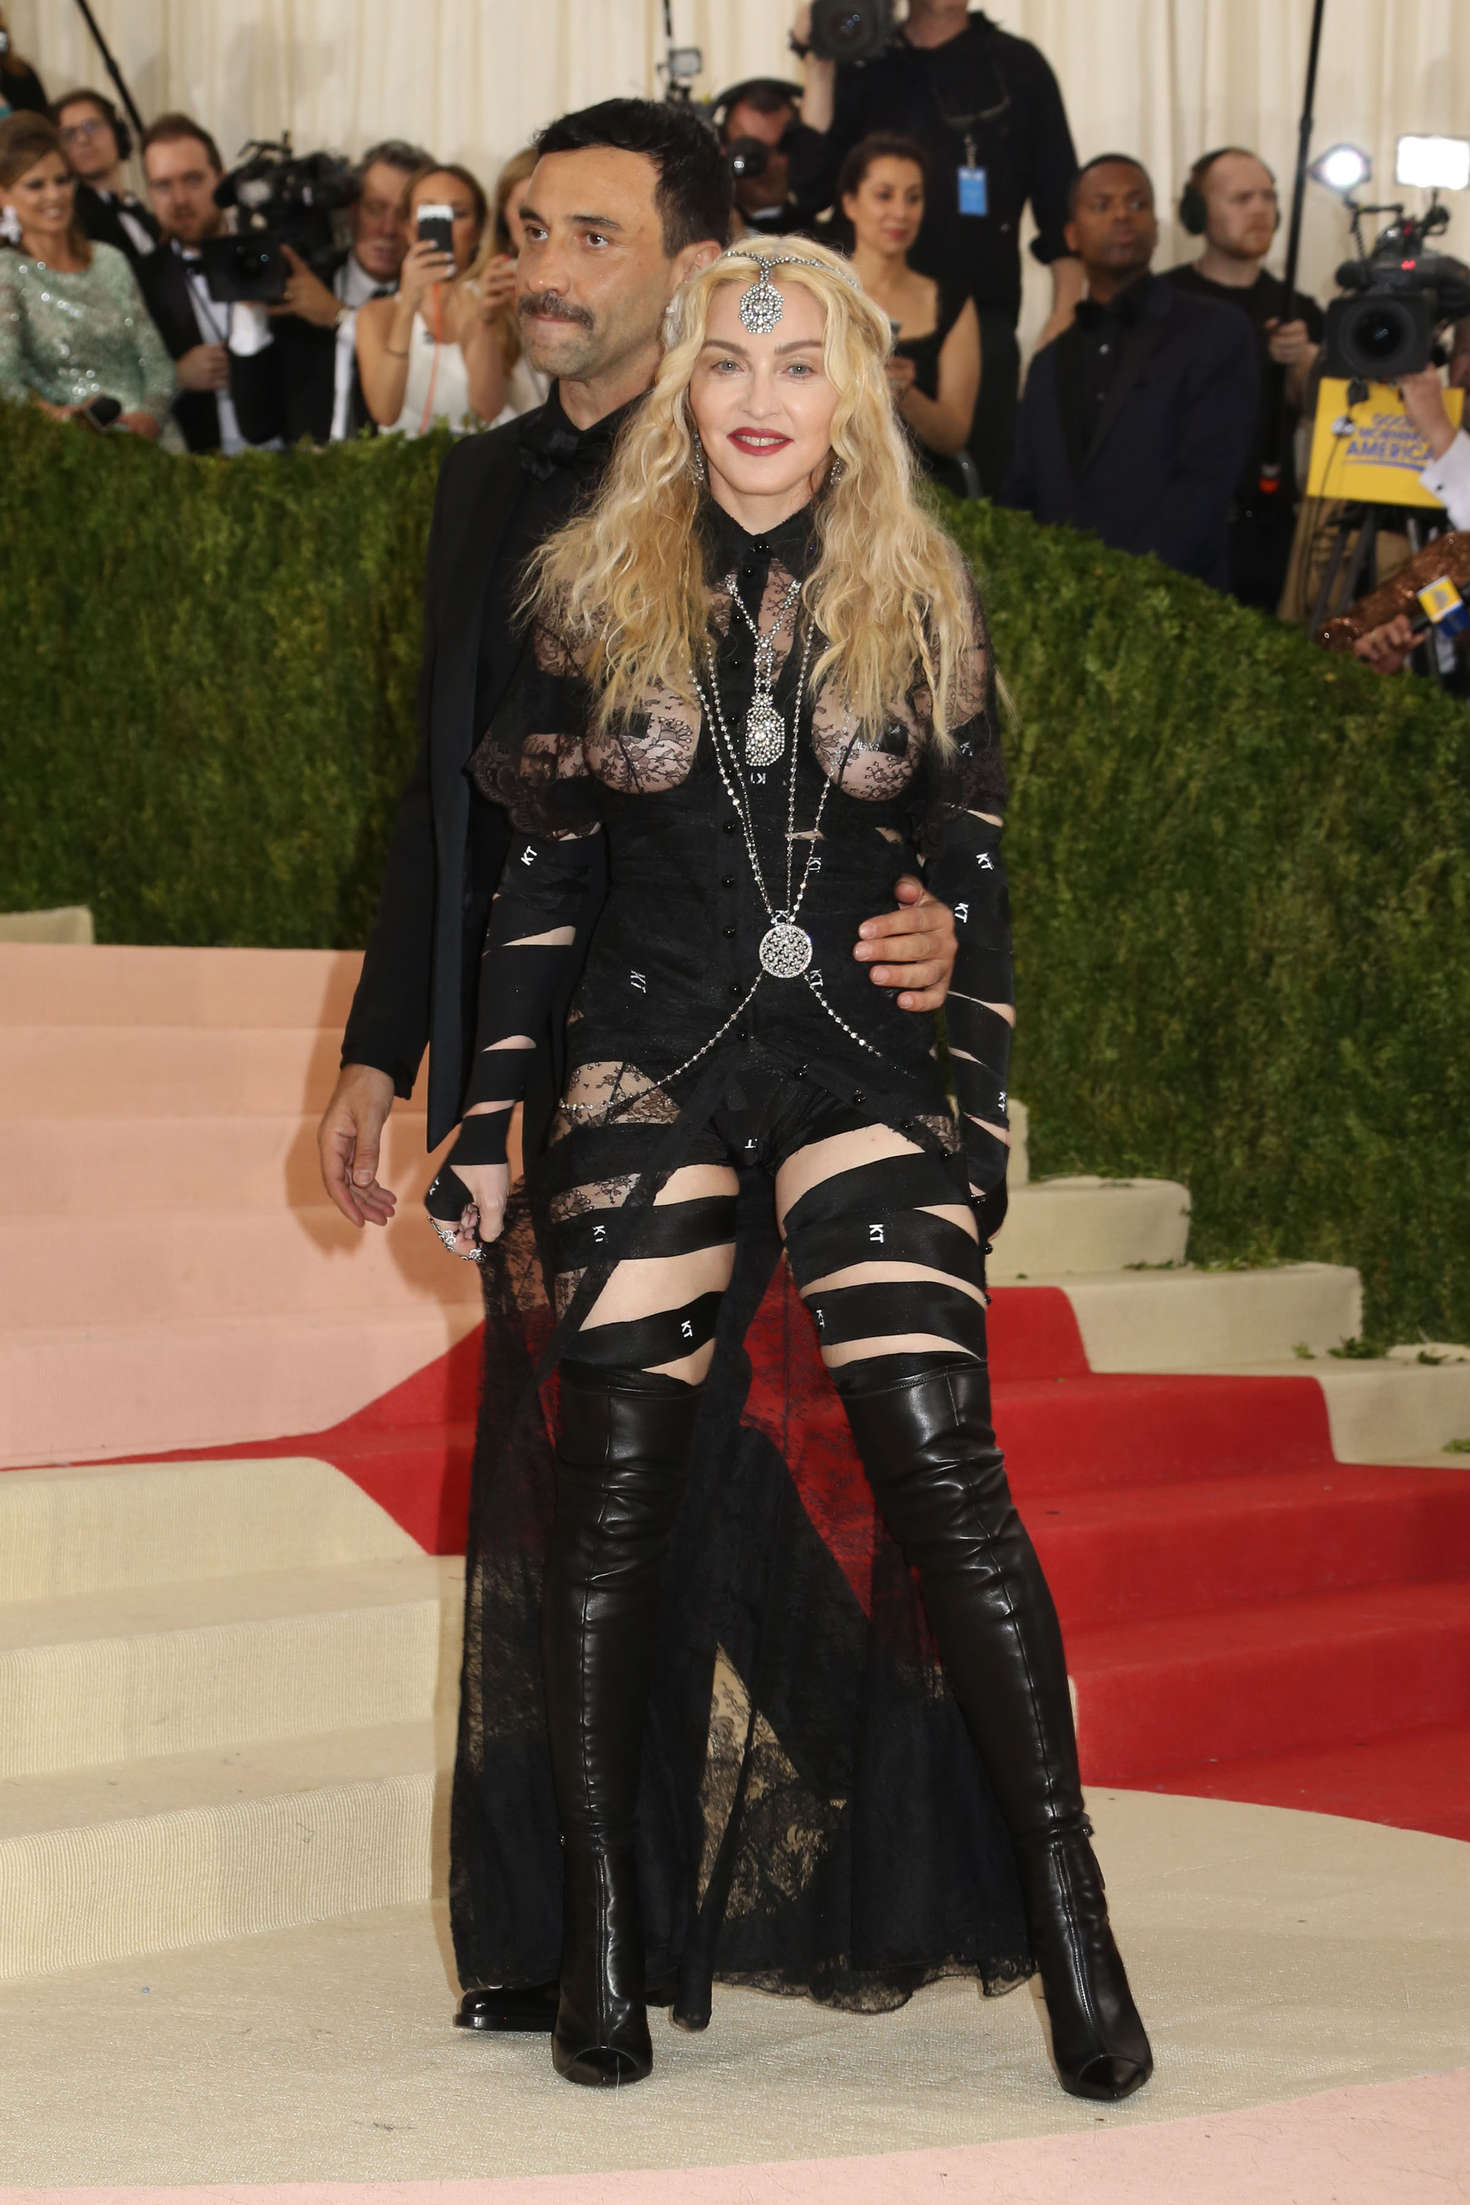 Madonna Met Gala in New York